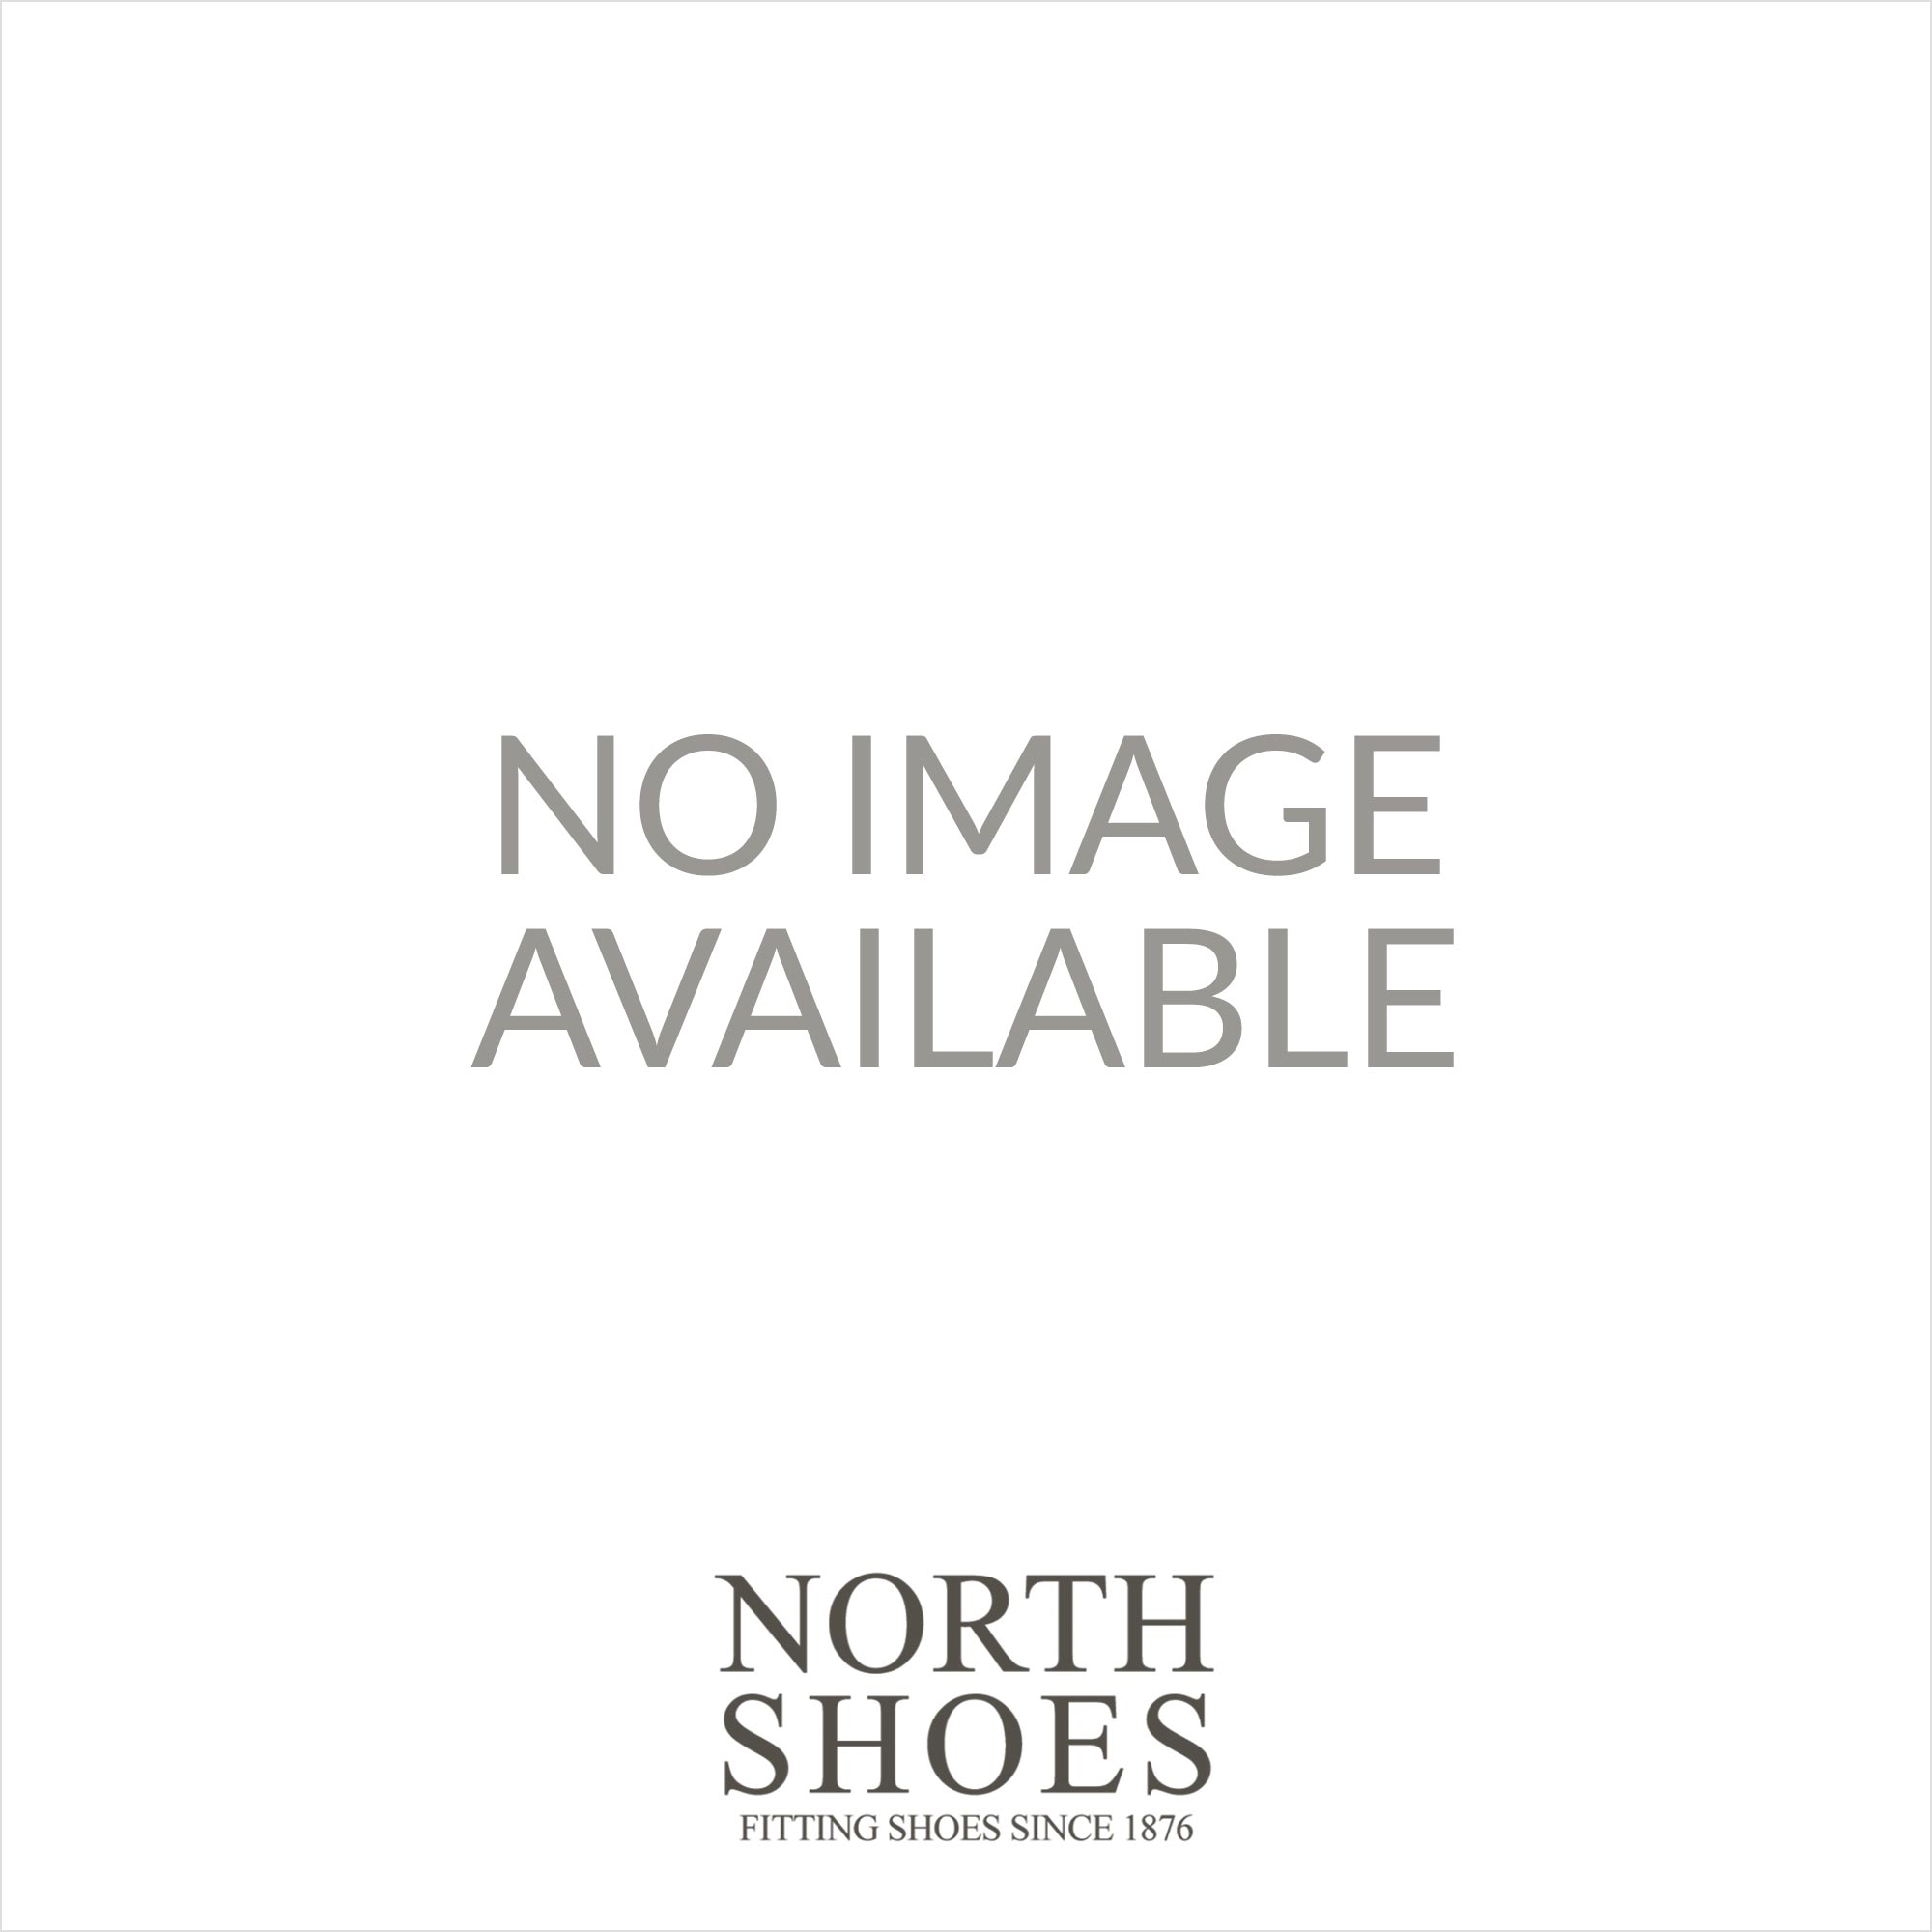 8b93171f1 Josef Seibel Stefanie 23 Brown Nubuck Leather Womens Adjustable Walking  Sandal - Josef Seibel from North Shoes UK